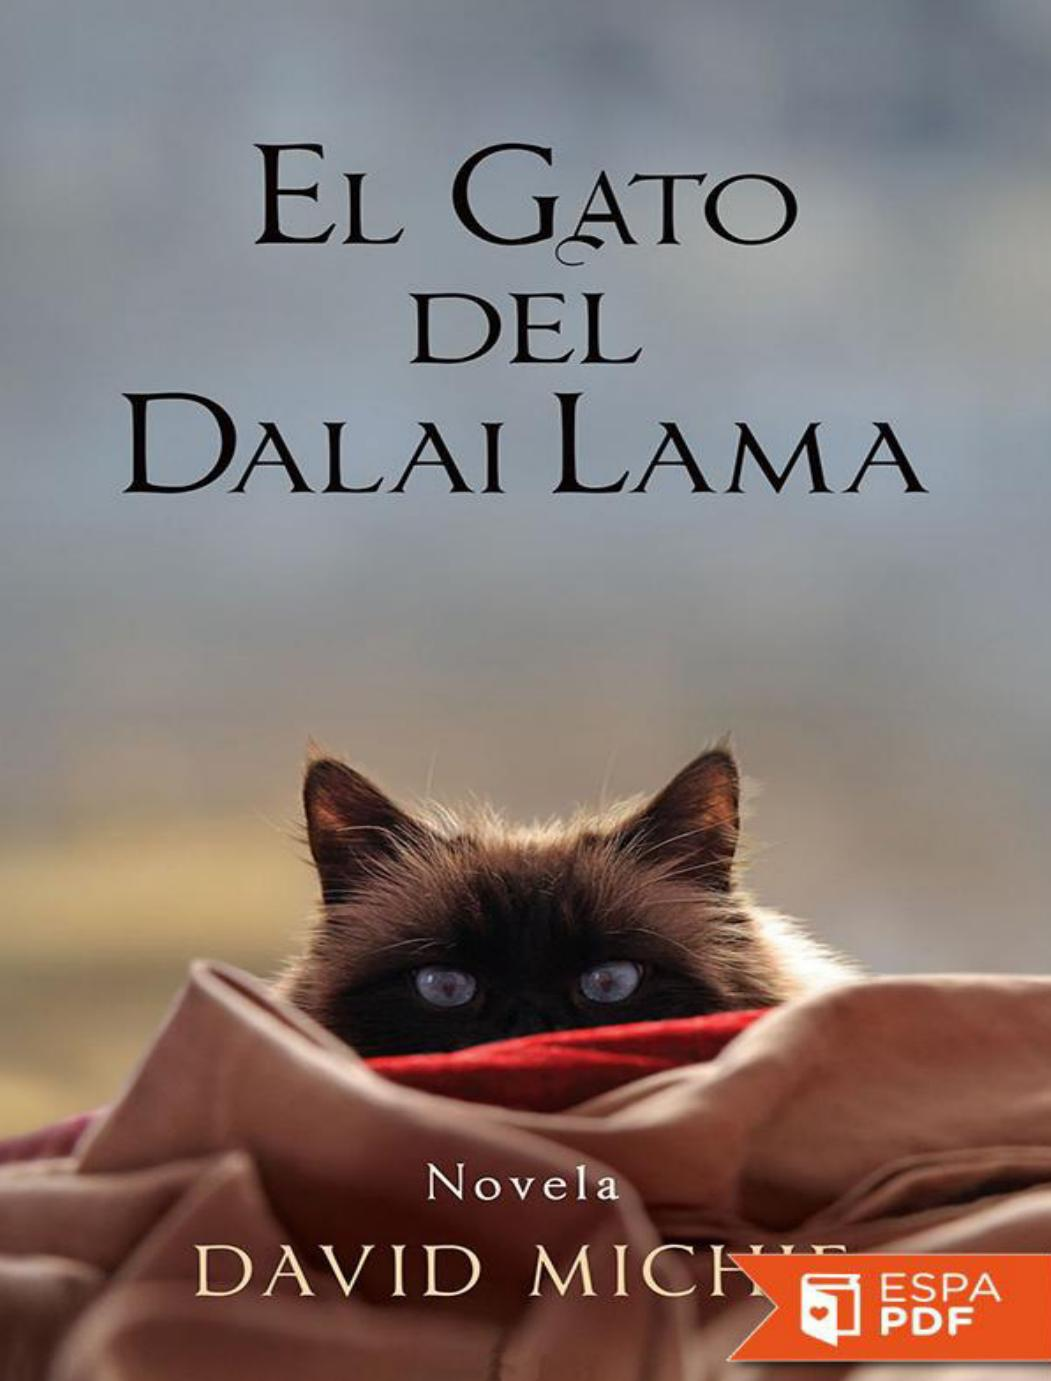 El gato del dalai lama (a) by PaMelito Nanayatzin Netzahualcoyotl L ...